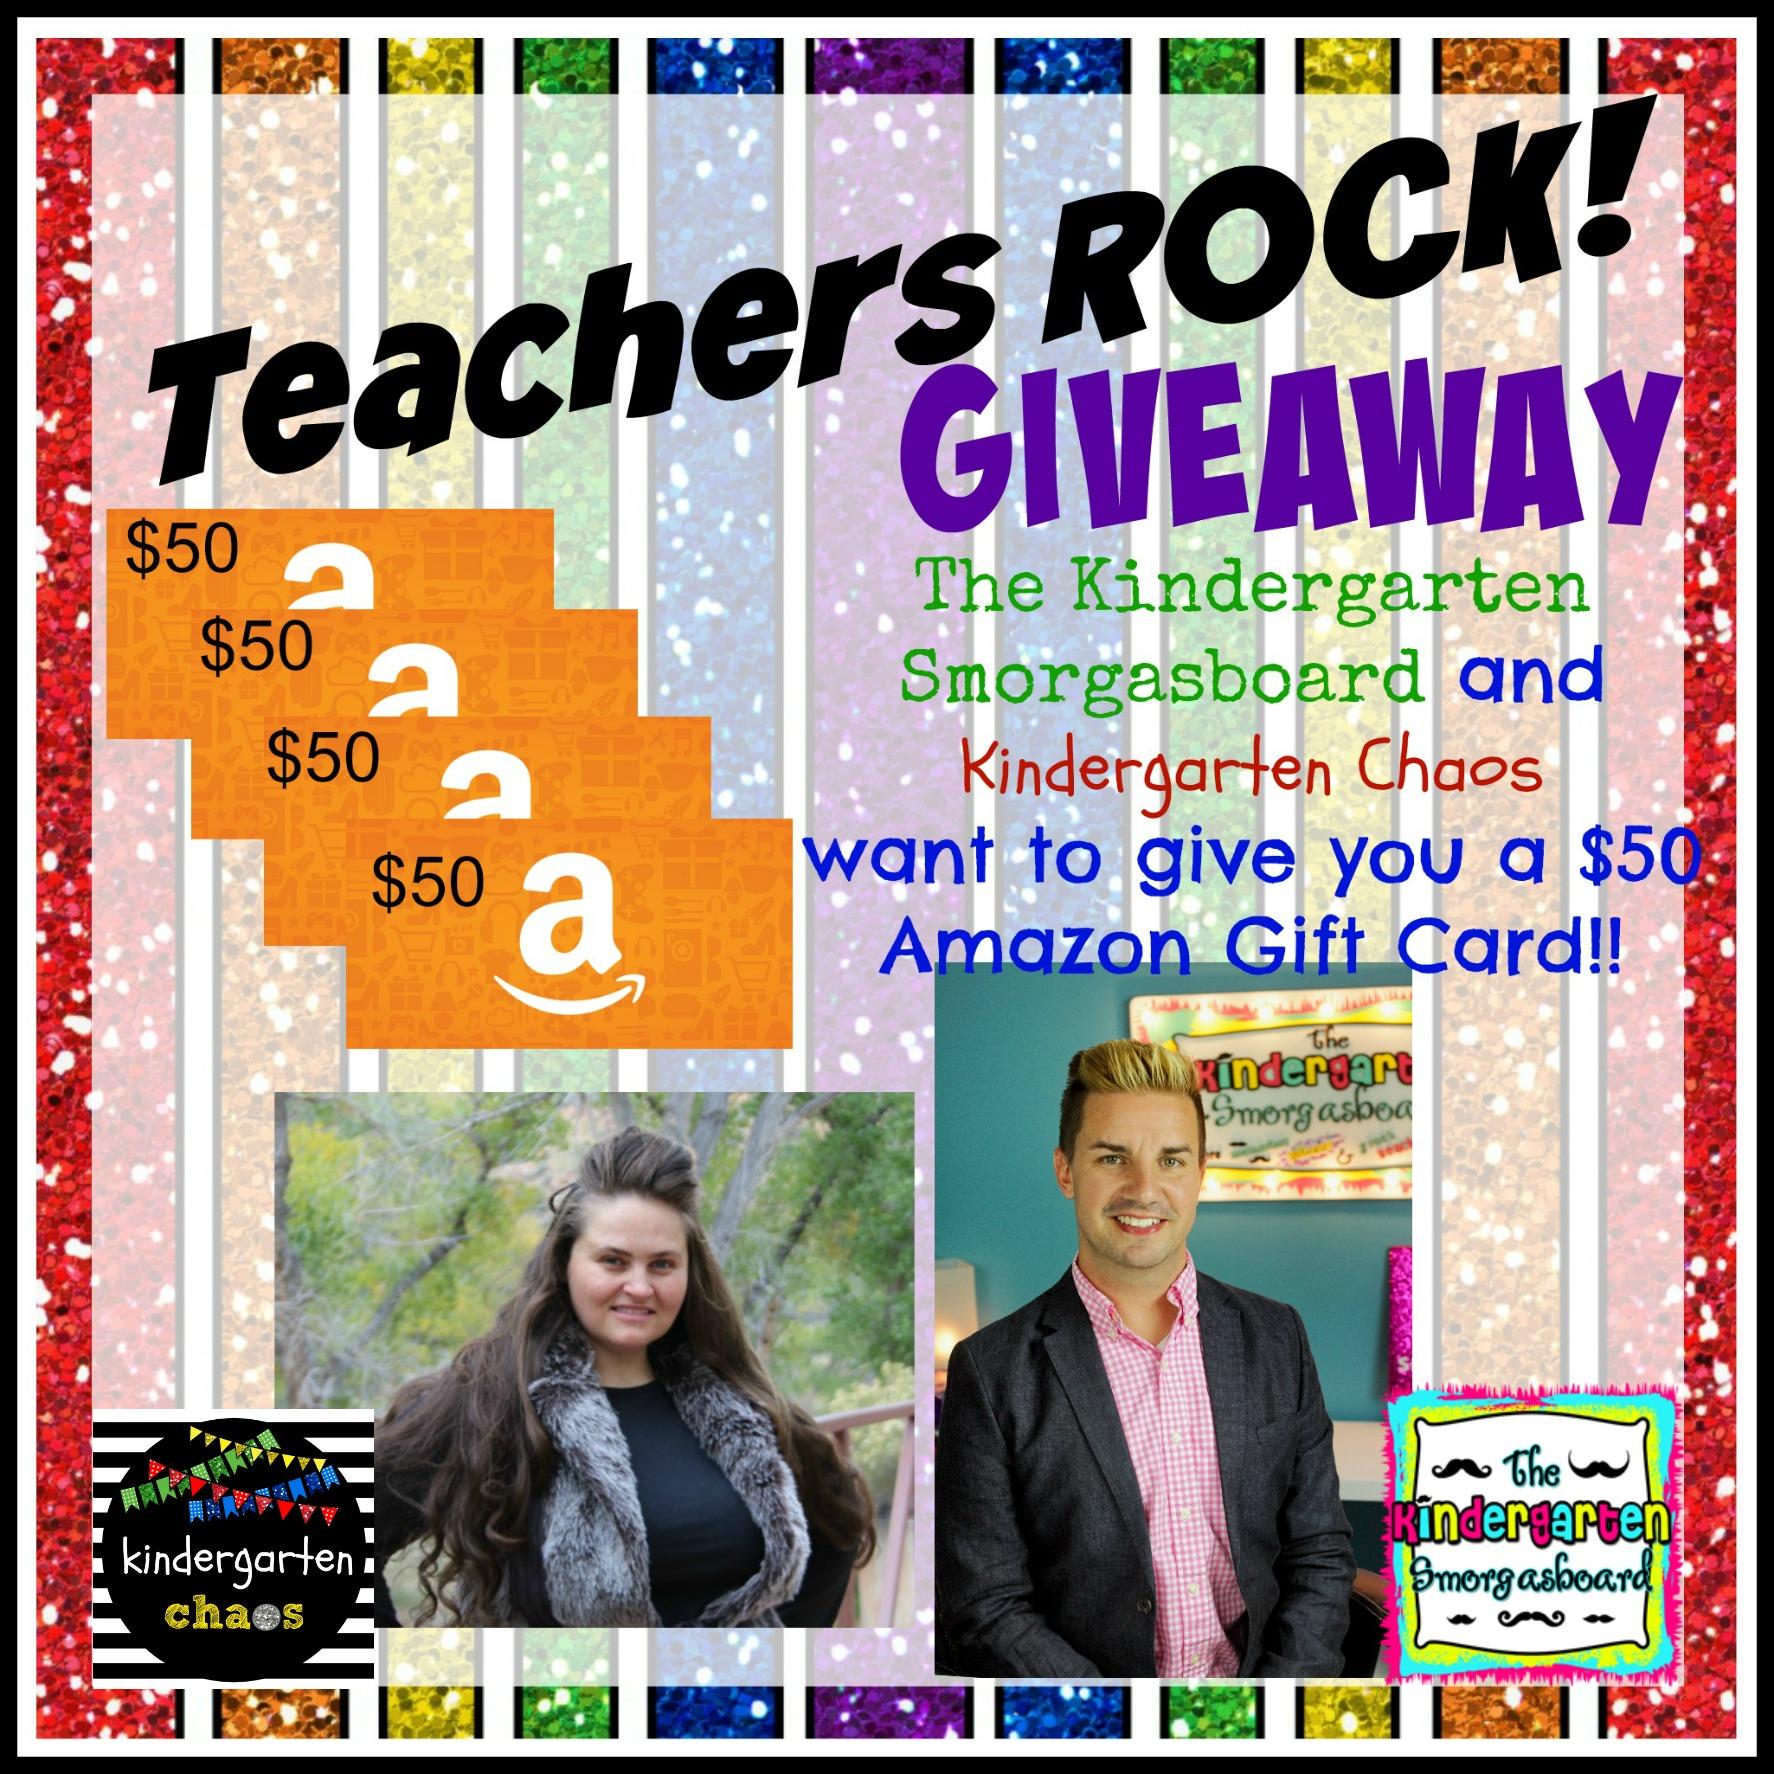 teachers-rock-giveway-2016